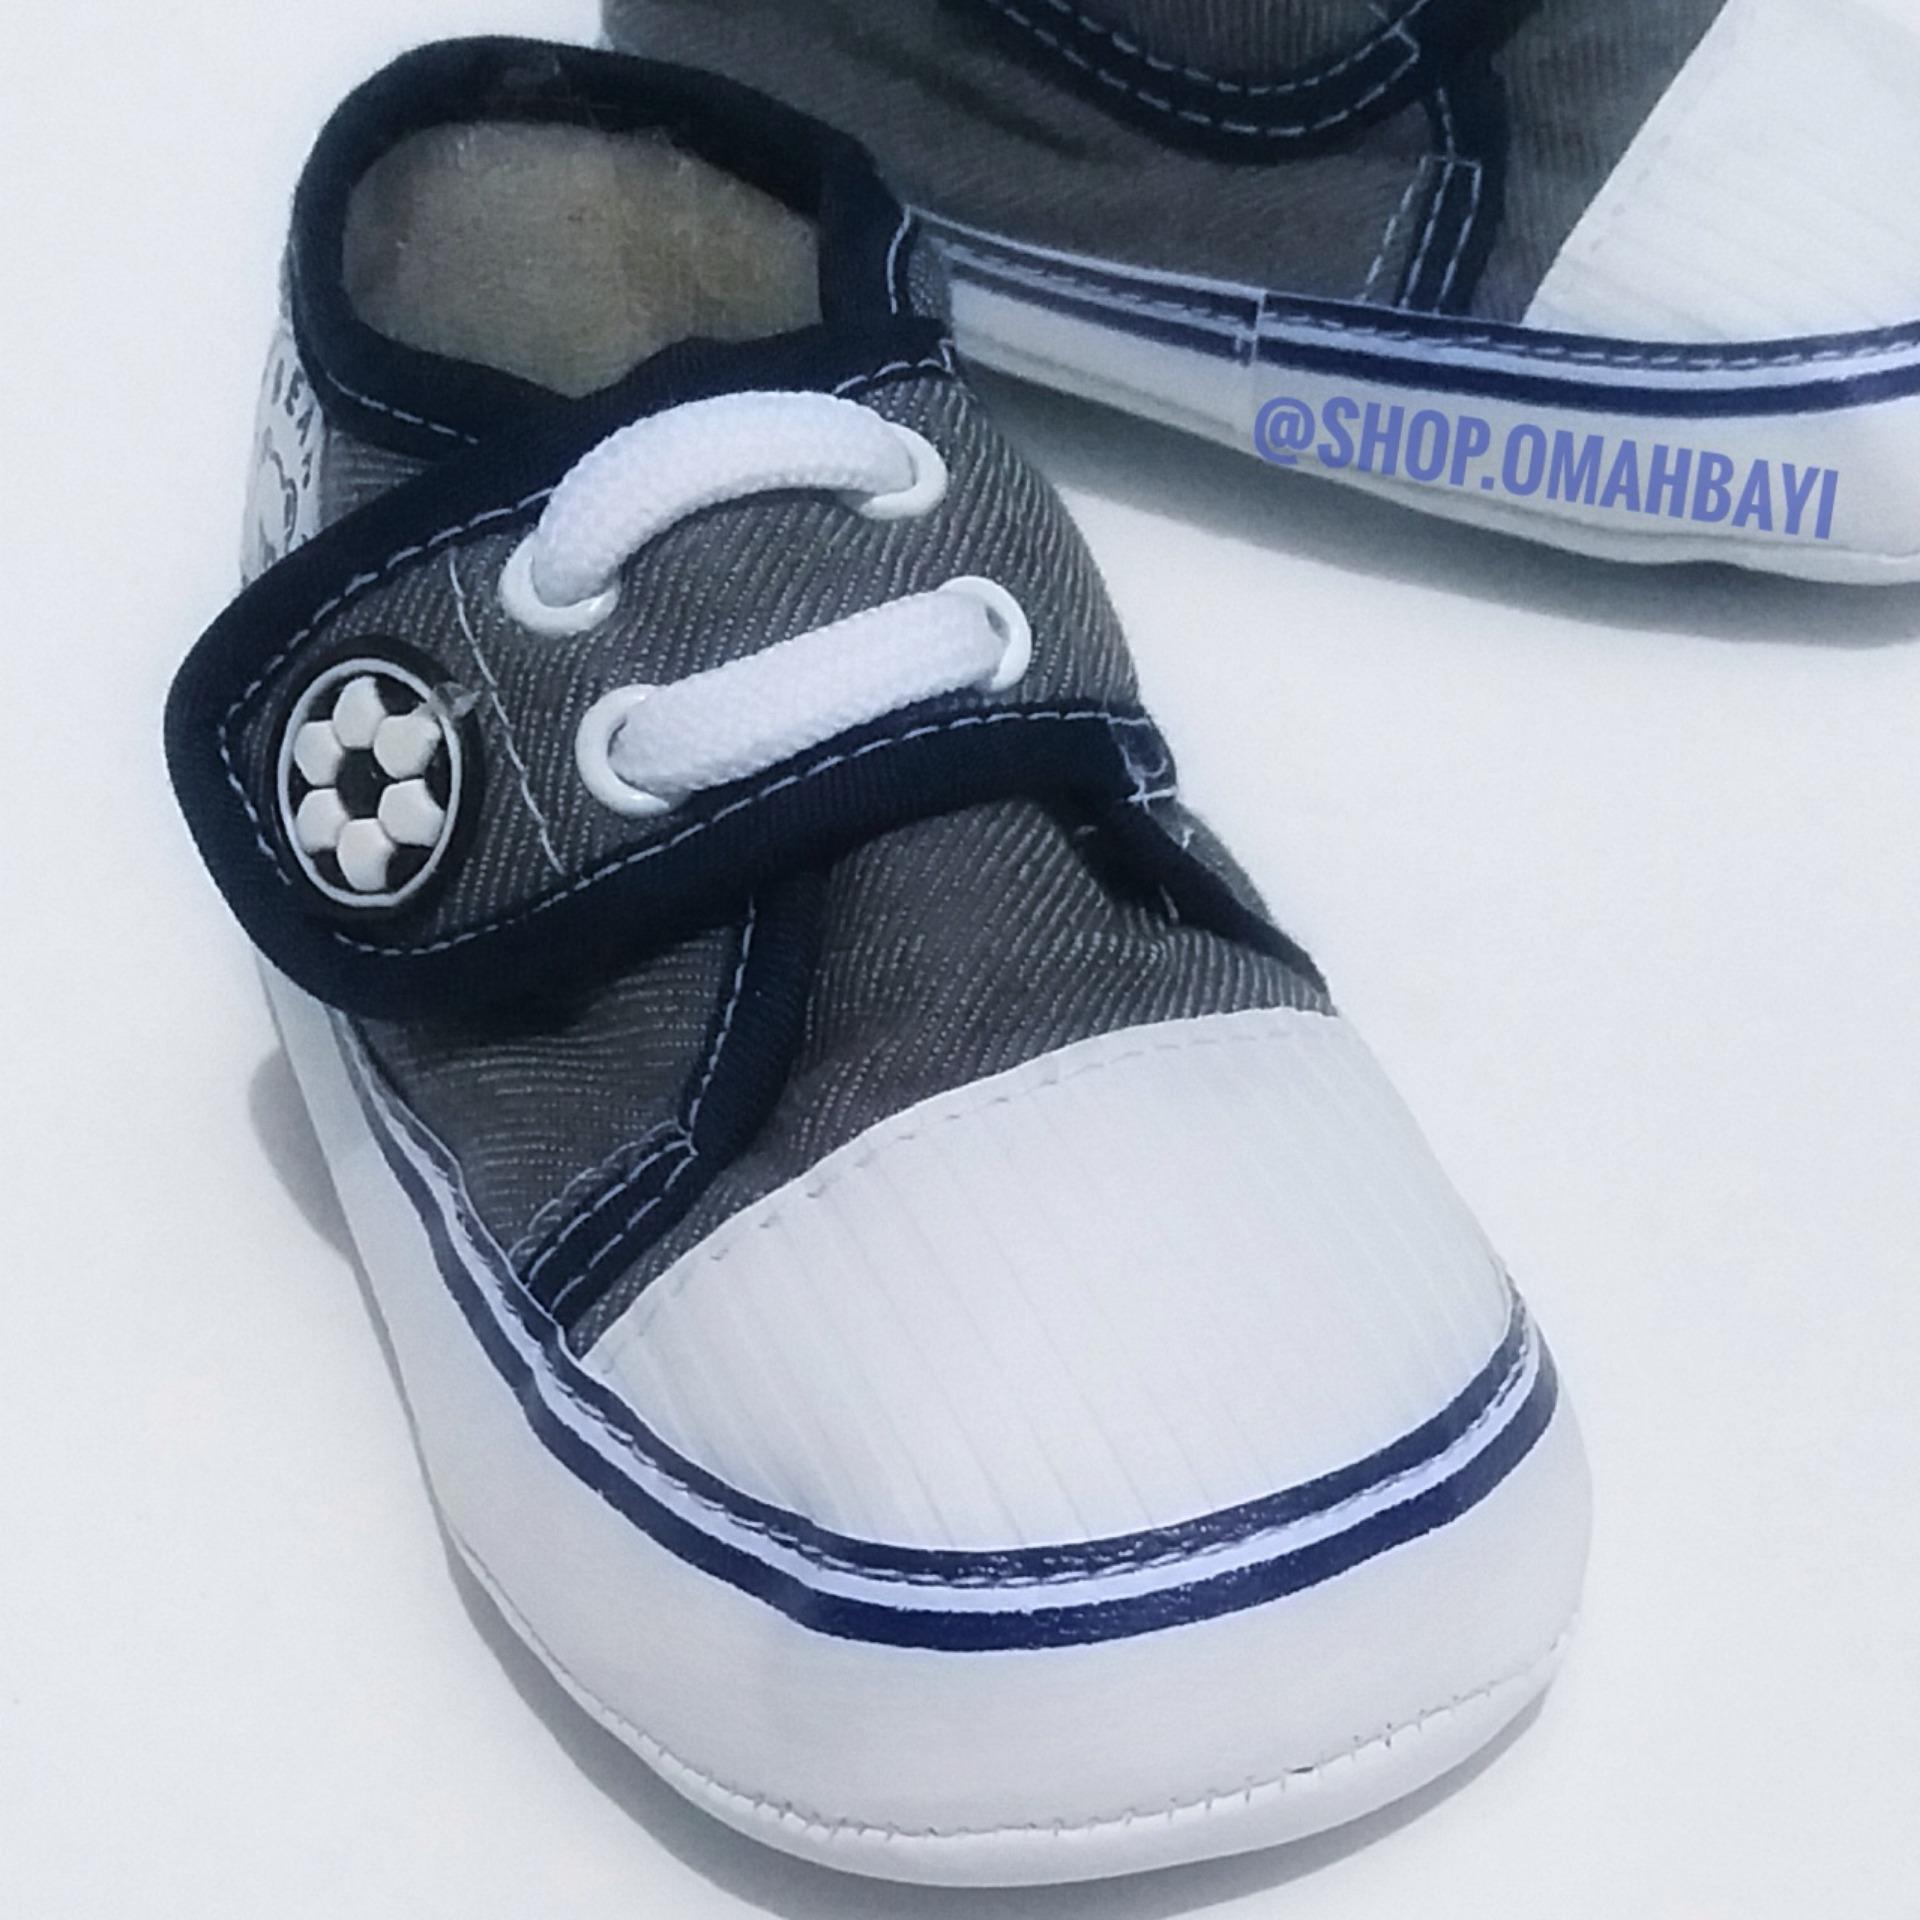 OMAHBAYI - Sepatu Bayi Baru Lahir New Born Laki-Laki Anak Cowok 0-9 Bulan Lucu Murah Bahan Lembut Motif Jeans Polos